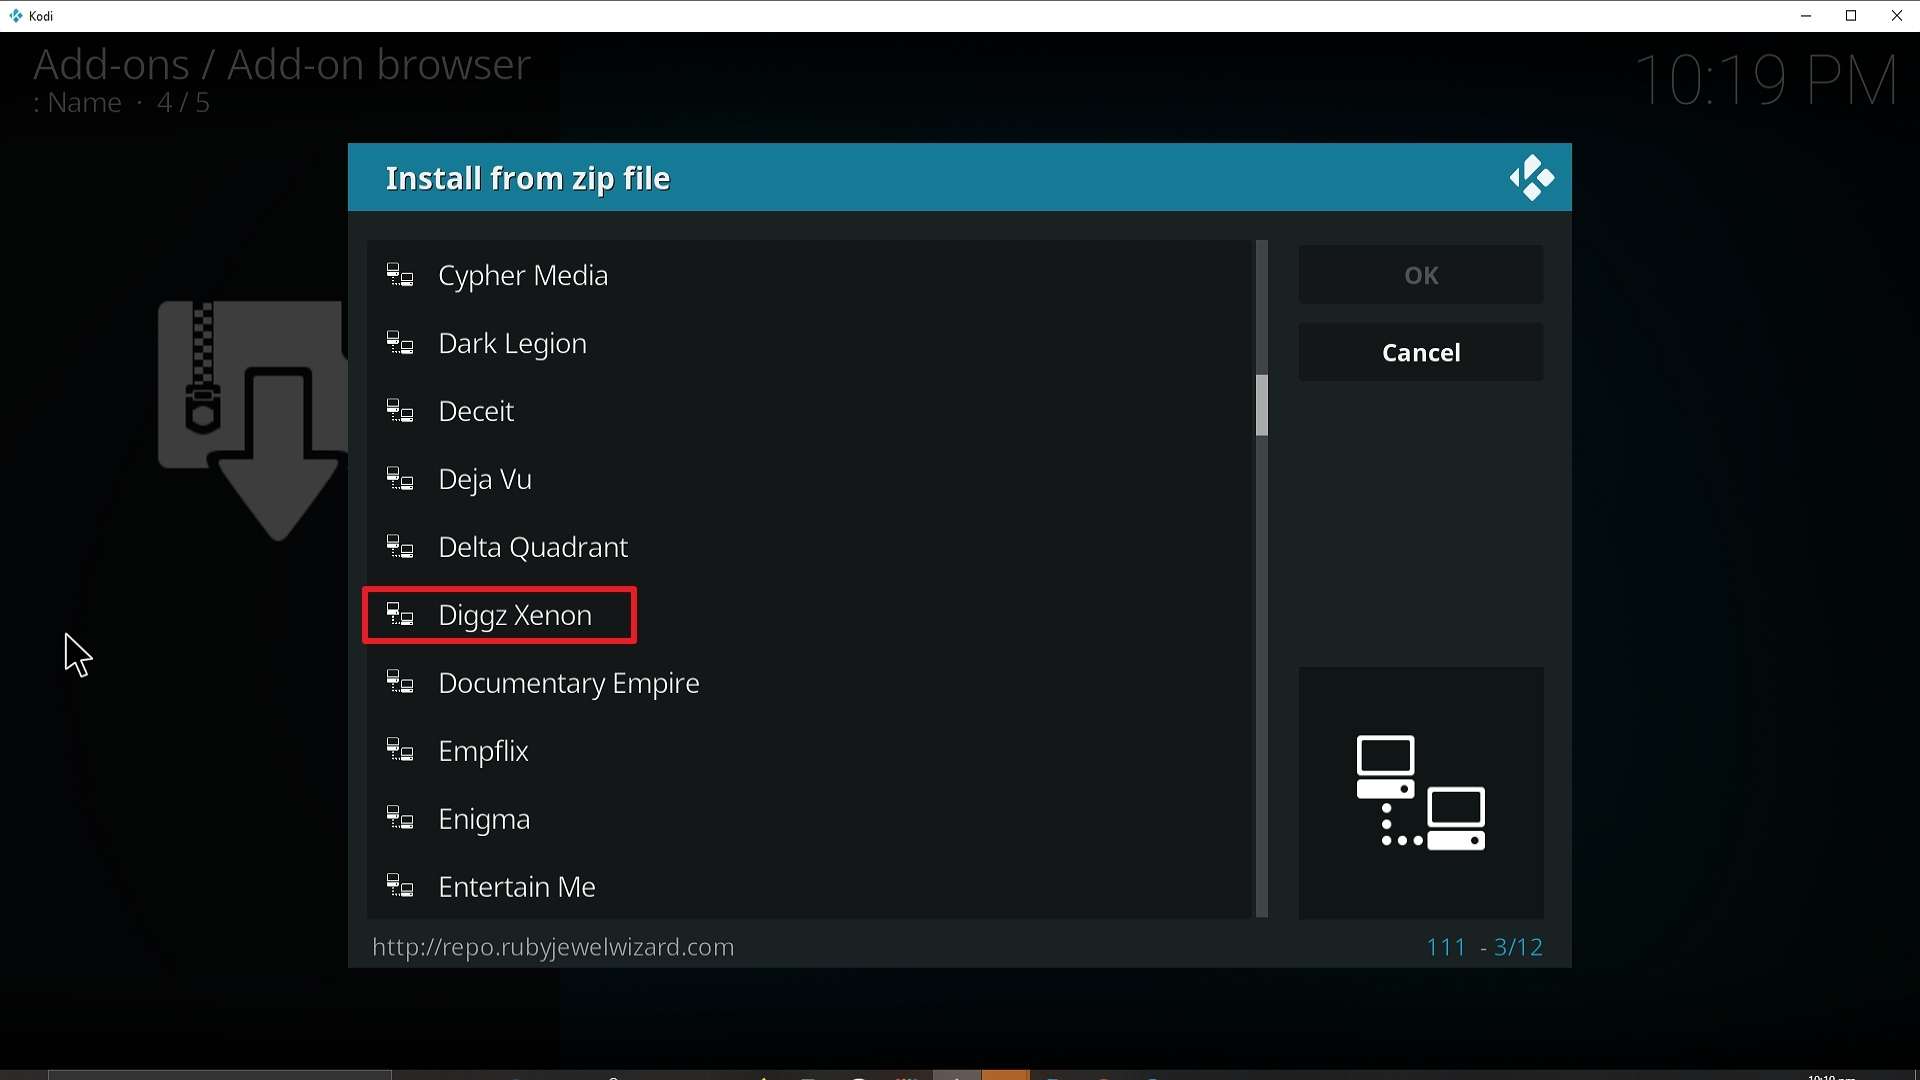 Step 17 Installing Diggz Xenon addon on Kodi